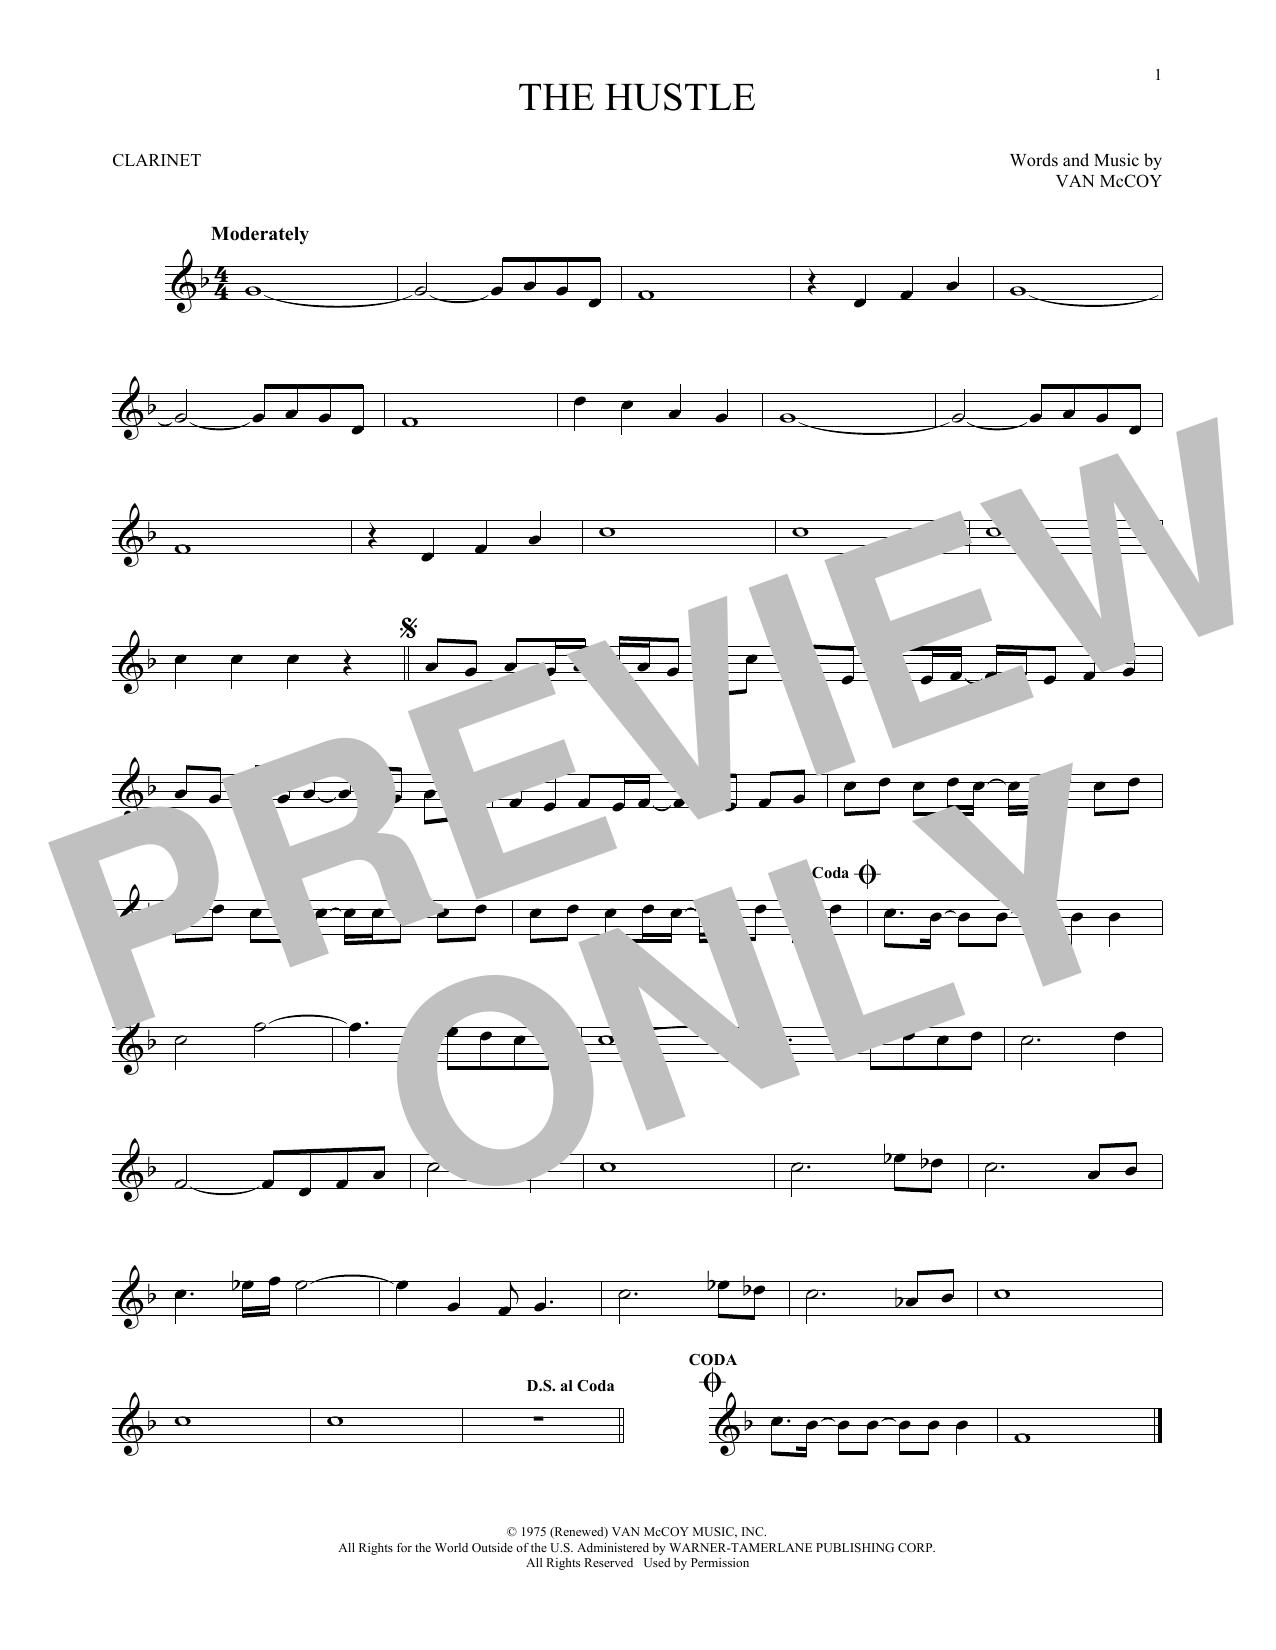 The Hustle (Clarinet Solo)